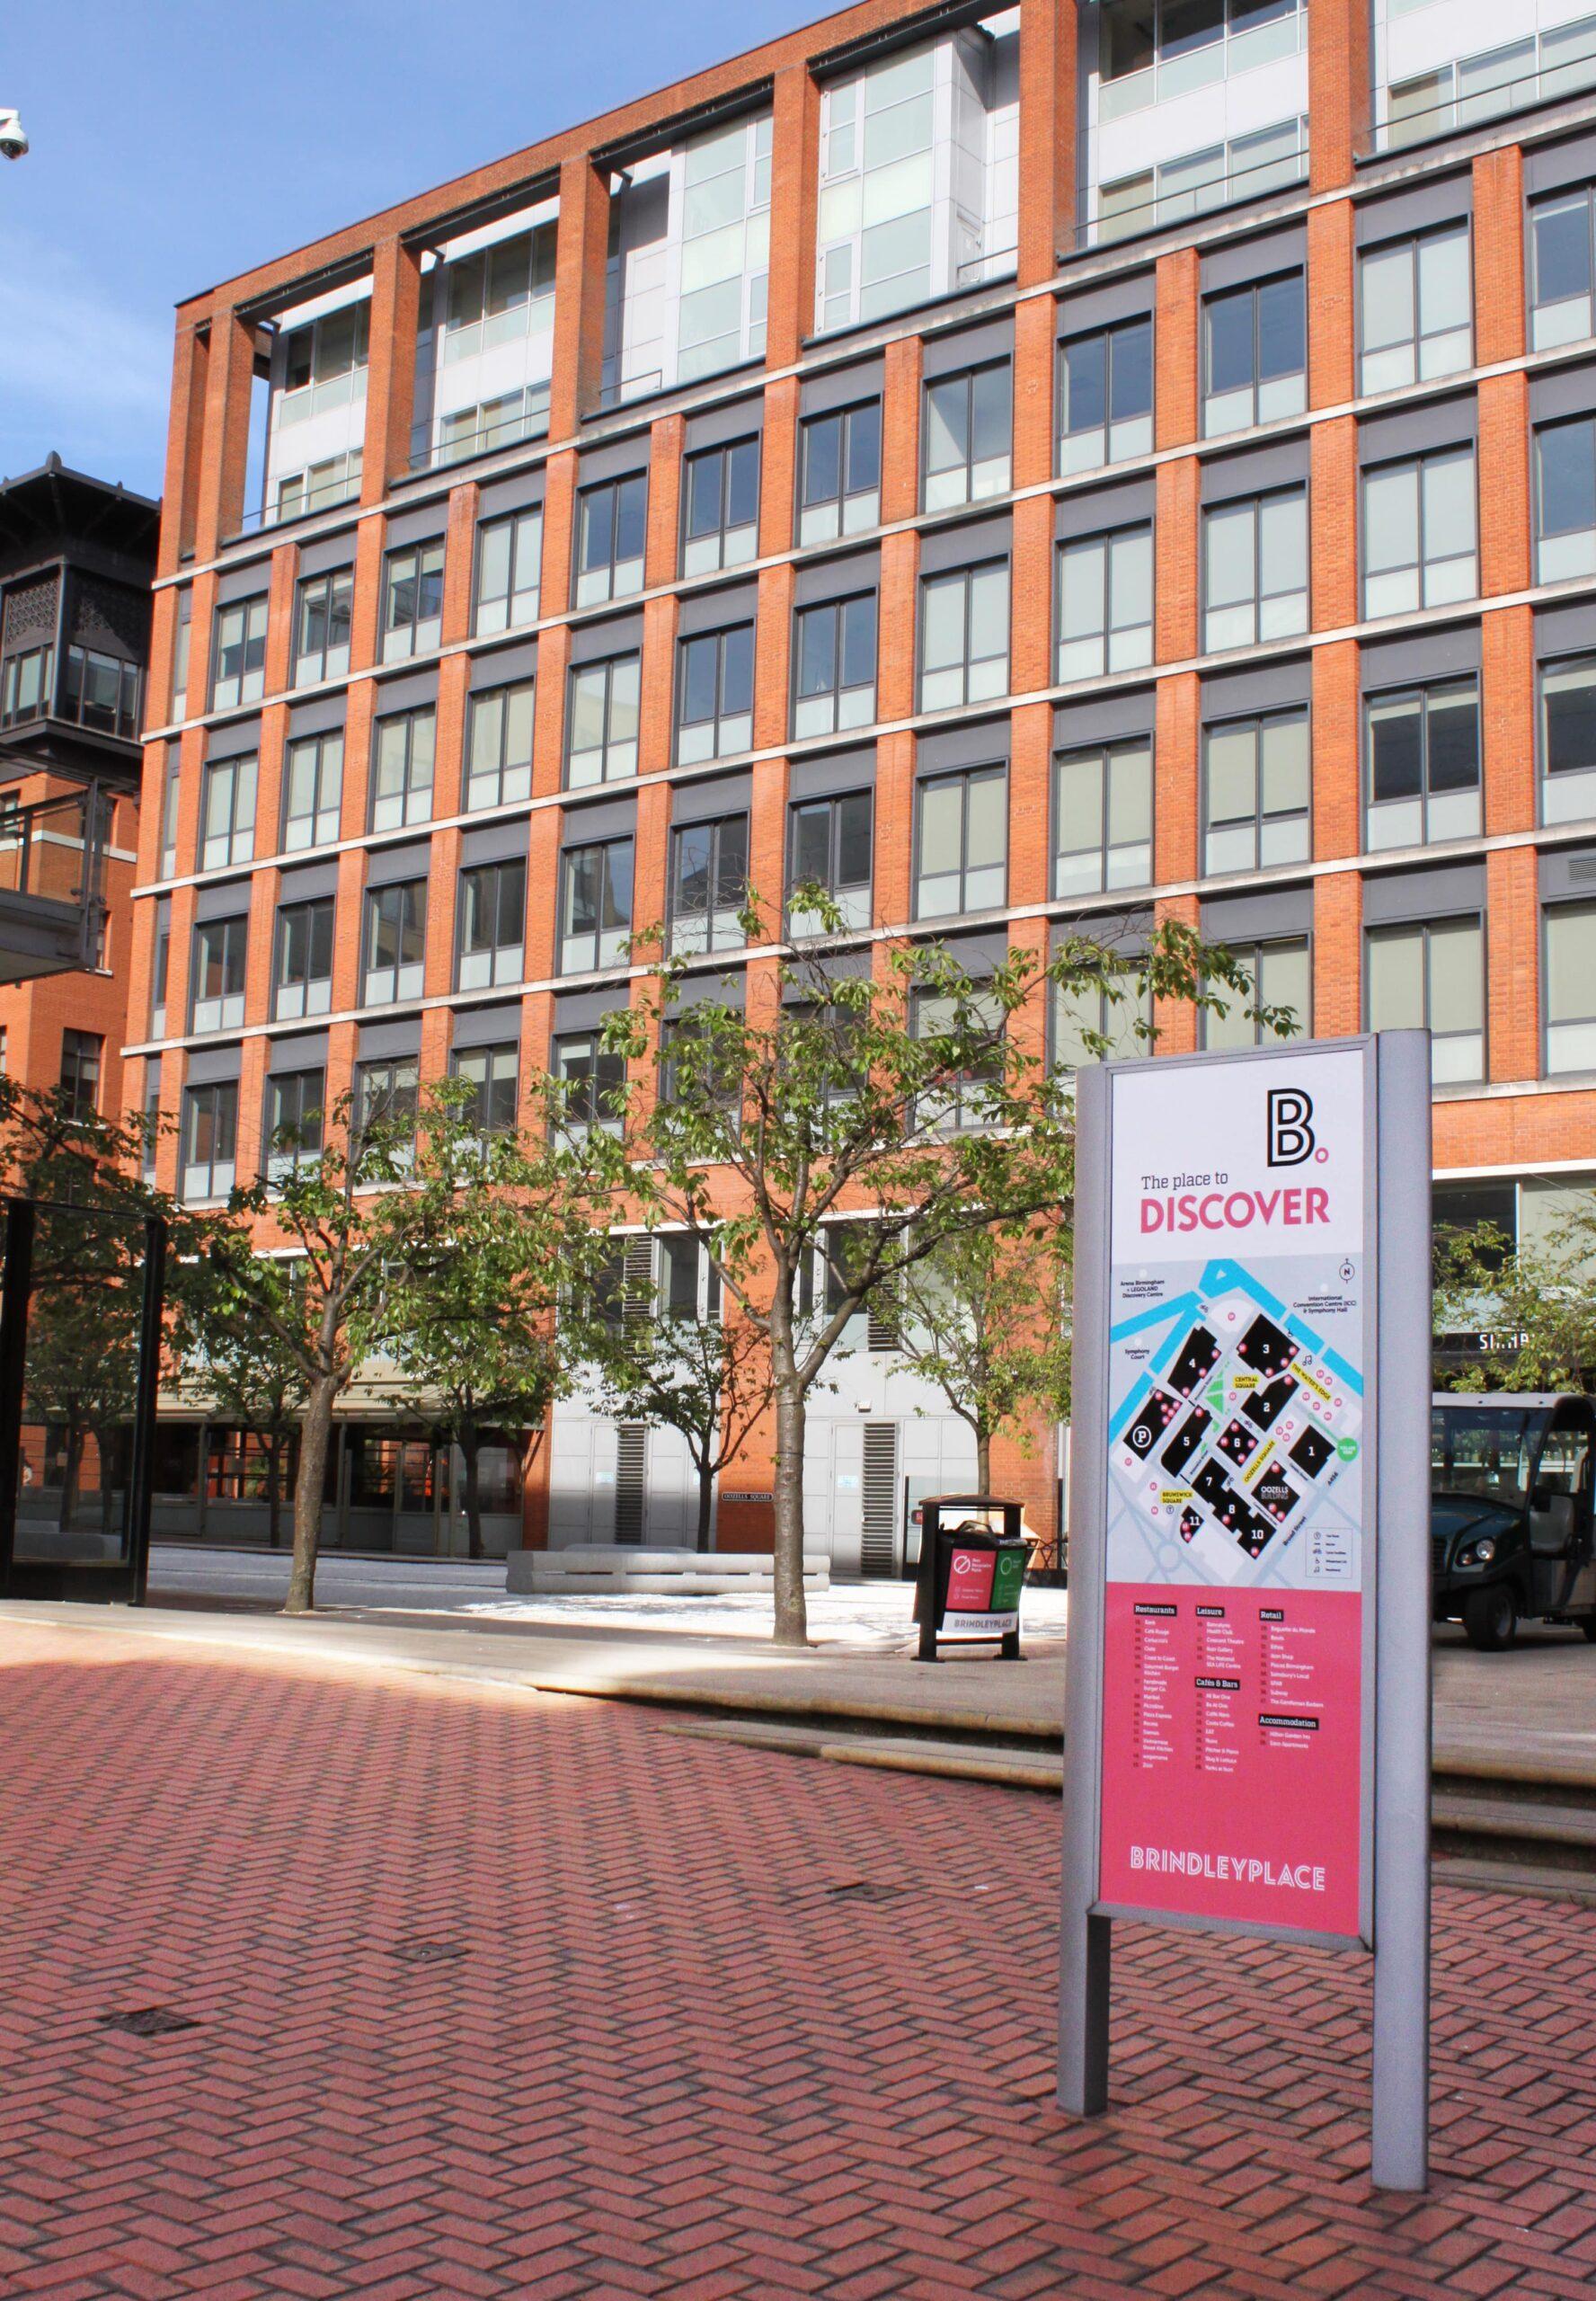 brindley-Place-Birmingham-Discover-signage-